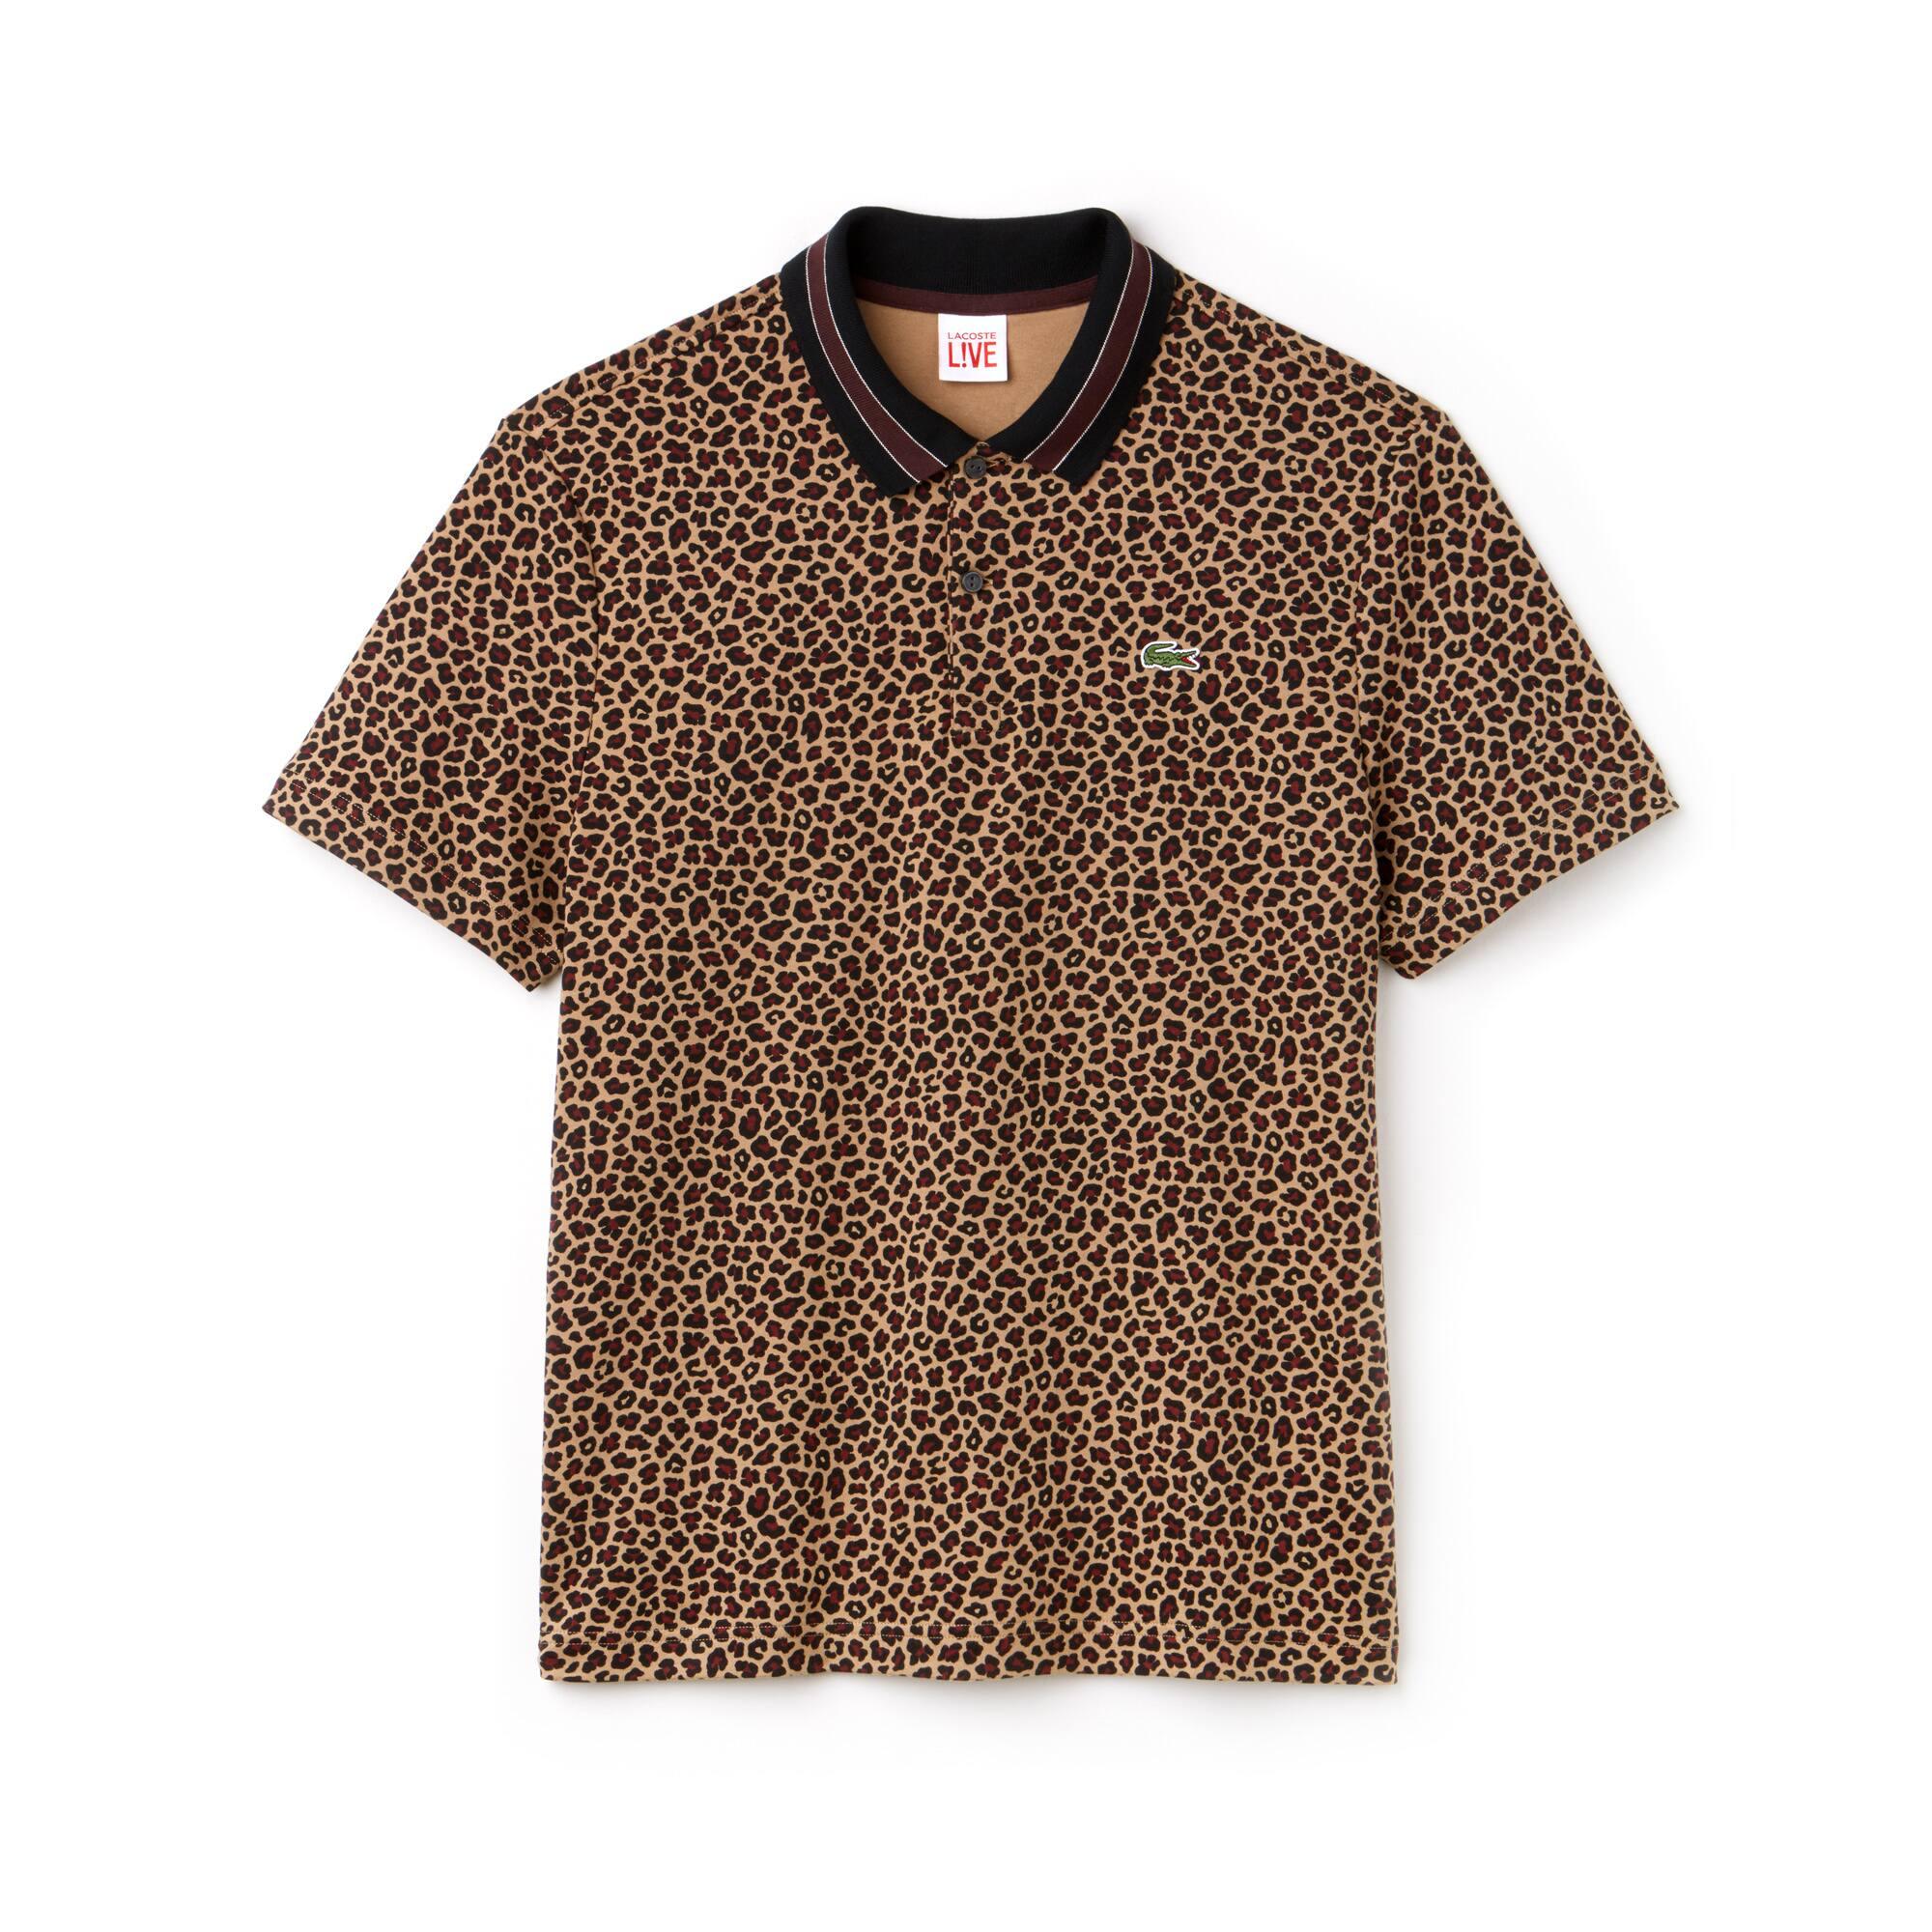 Herren LACOSTE L!VE Interlock-Poloshirt mit Leopard-Print